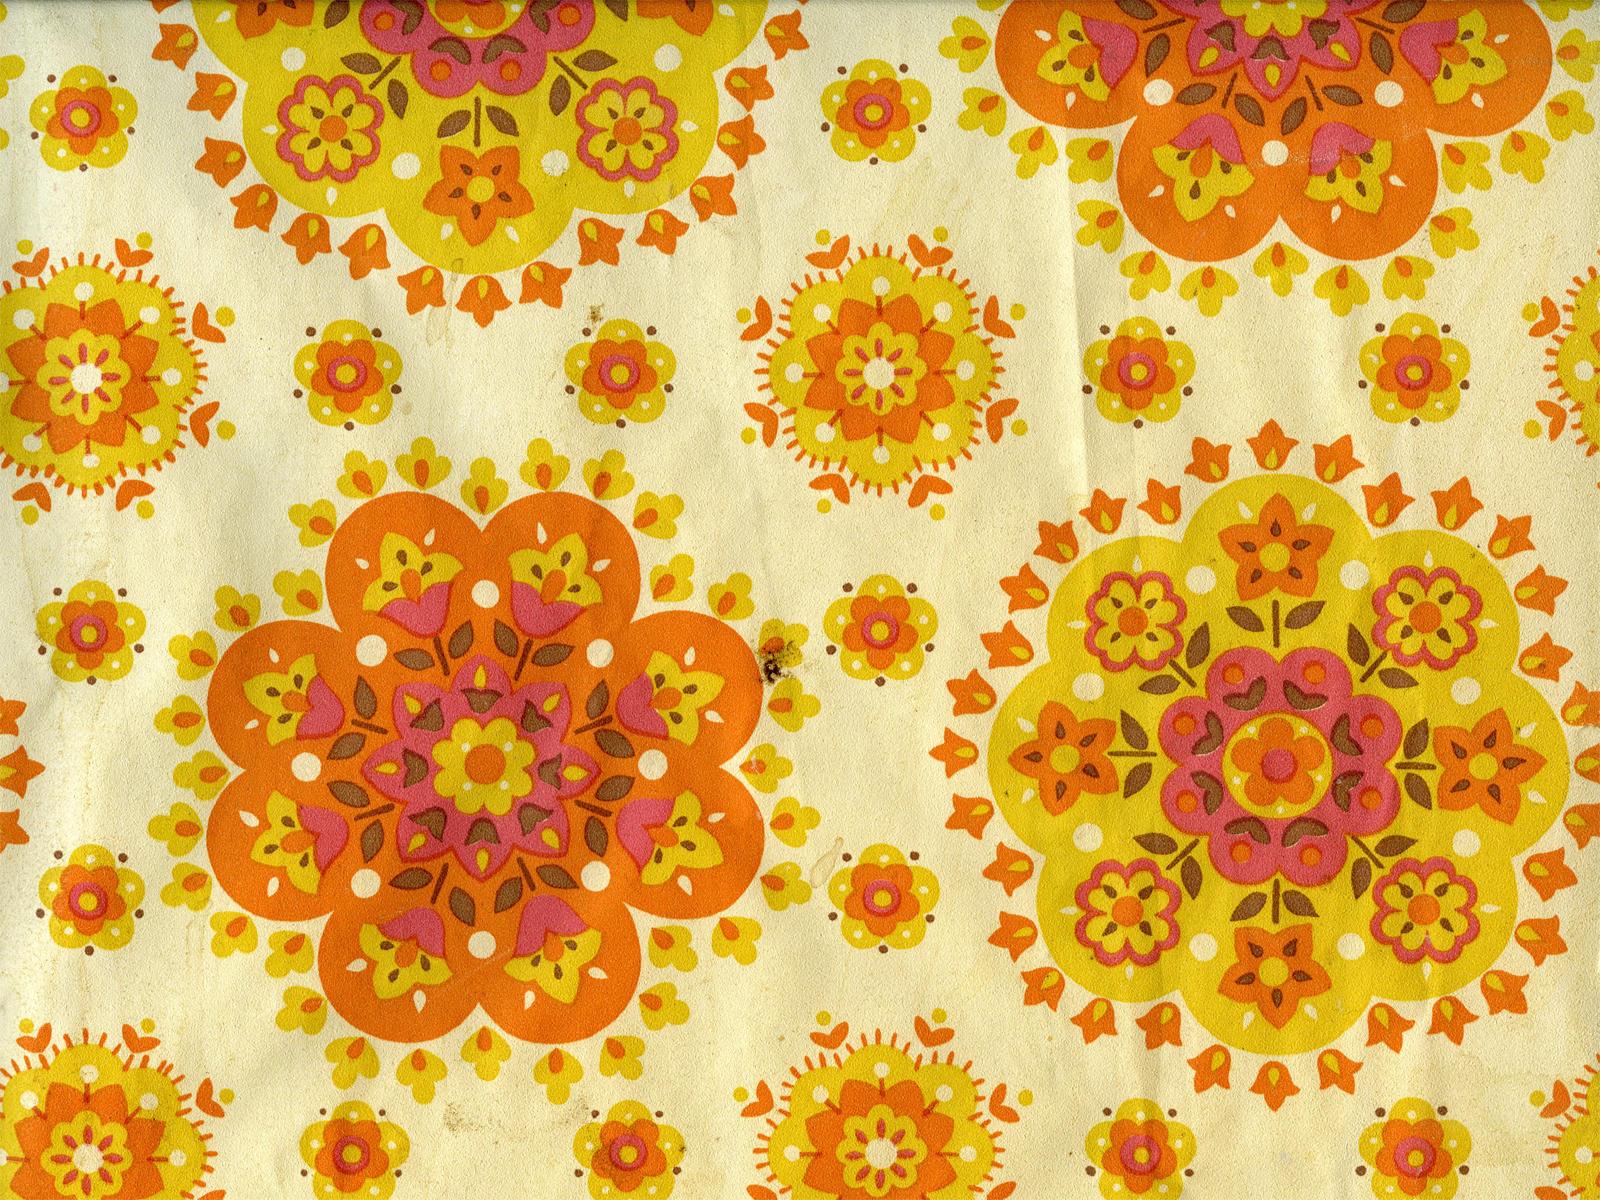 70s wallpaper patterns a - photo #14